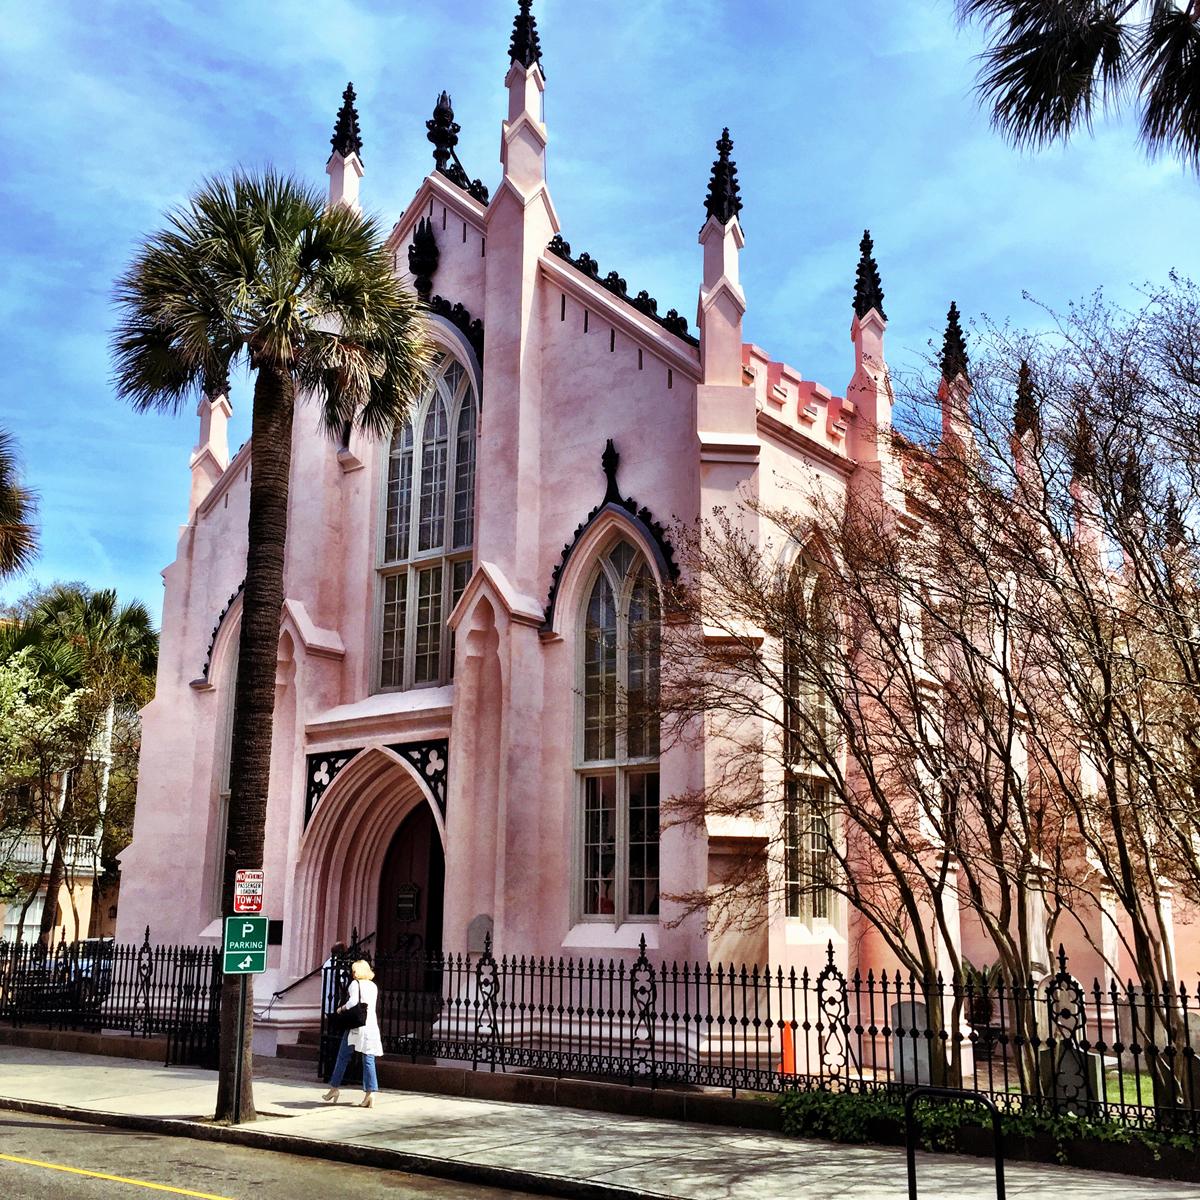 The French Huguenot Church. 136 Church Street. Architect Edward Brickell White